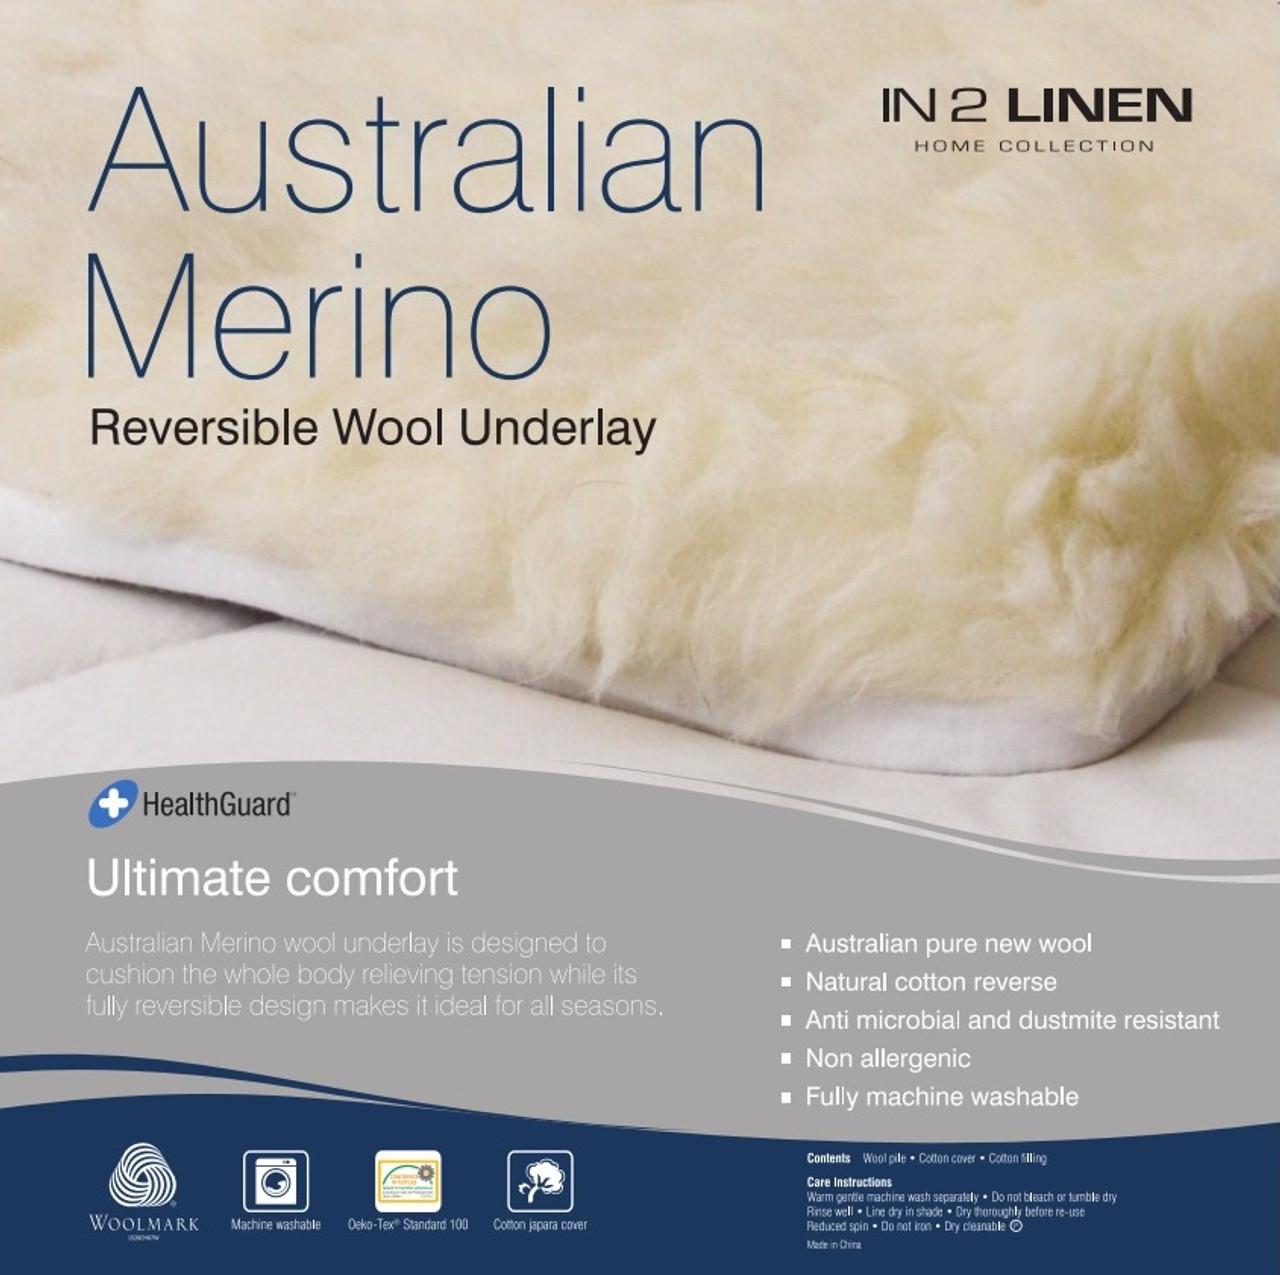 Woollen Underlay Double Bed Size Australian Merino Wool Reversible